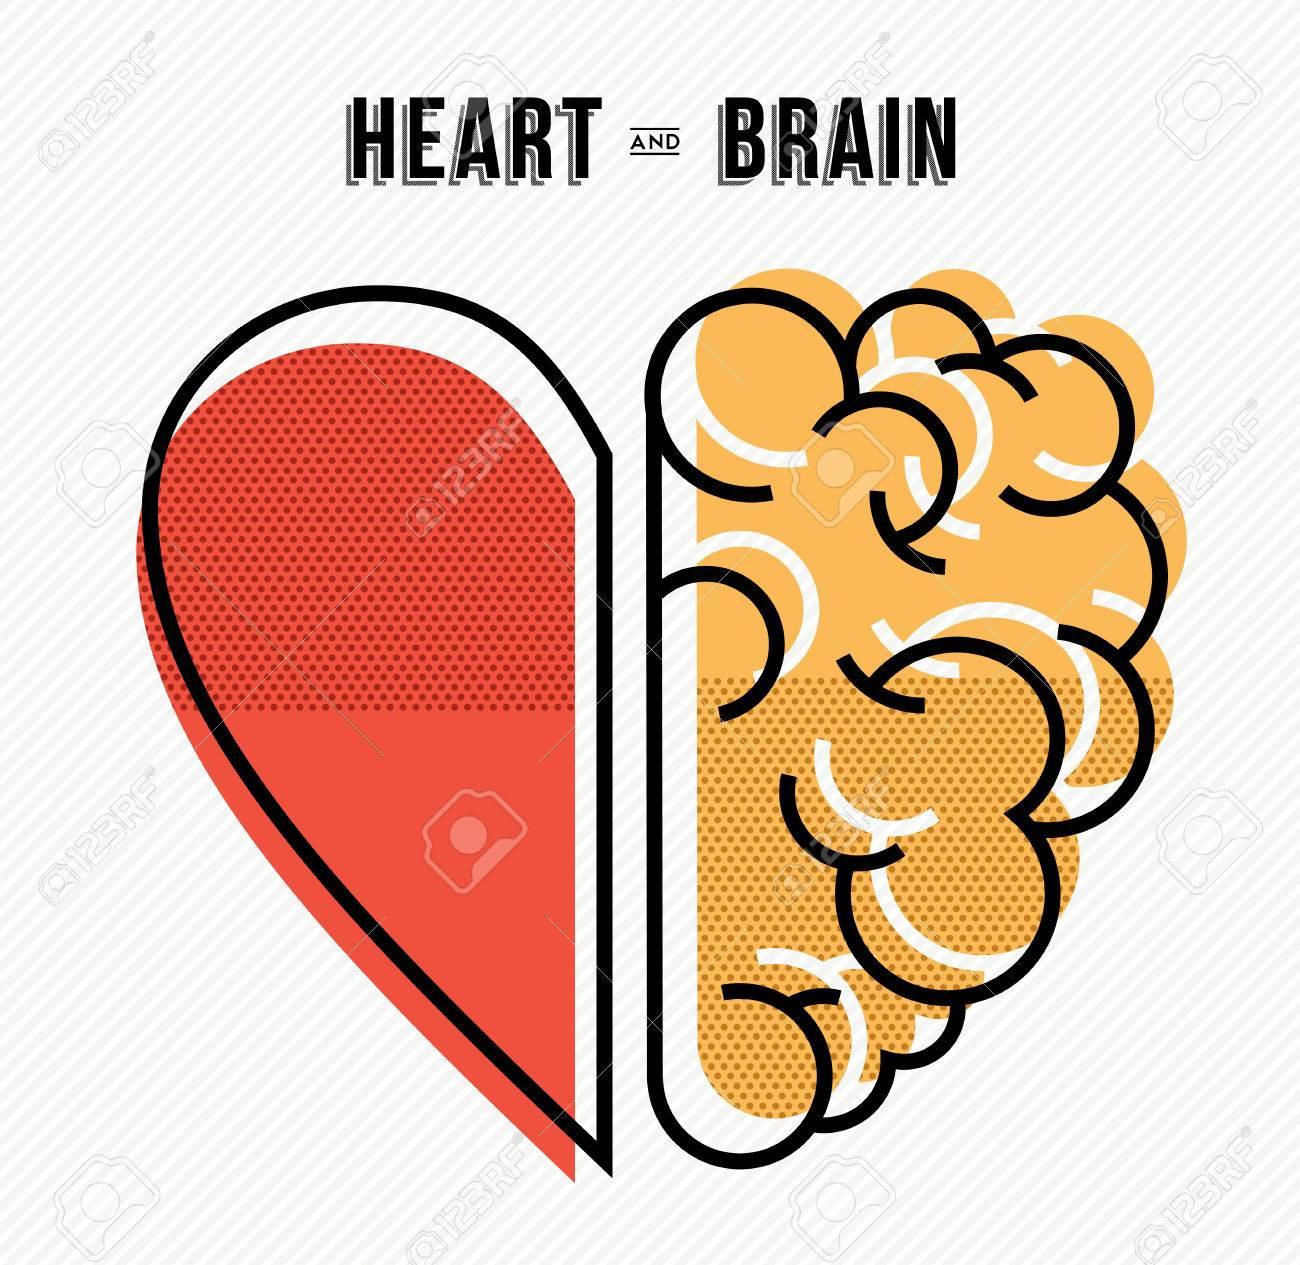 Heart and brain work as team concept design, flat line art modern illustration. - 56349060